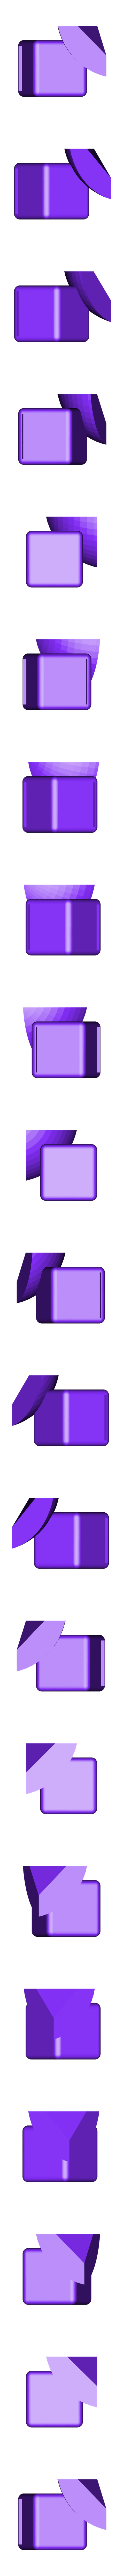 Corner_remix.stl Download free STL file Rubik's Cube Remixed • 3D printable design, lowboydrvr